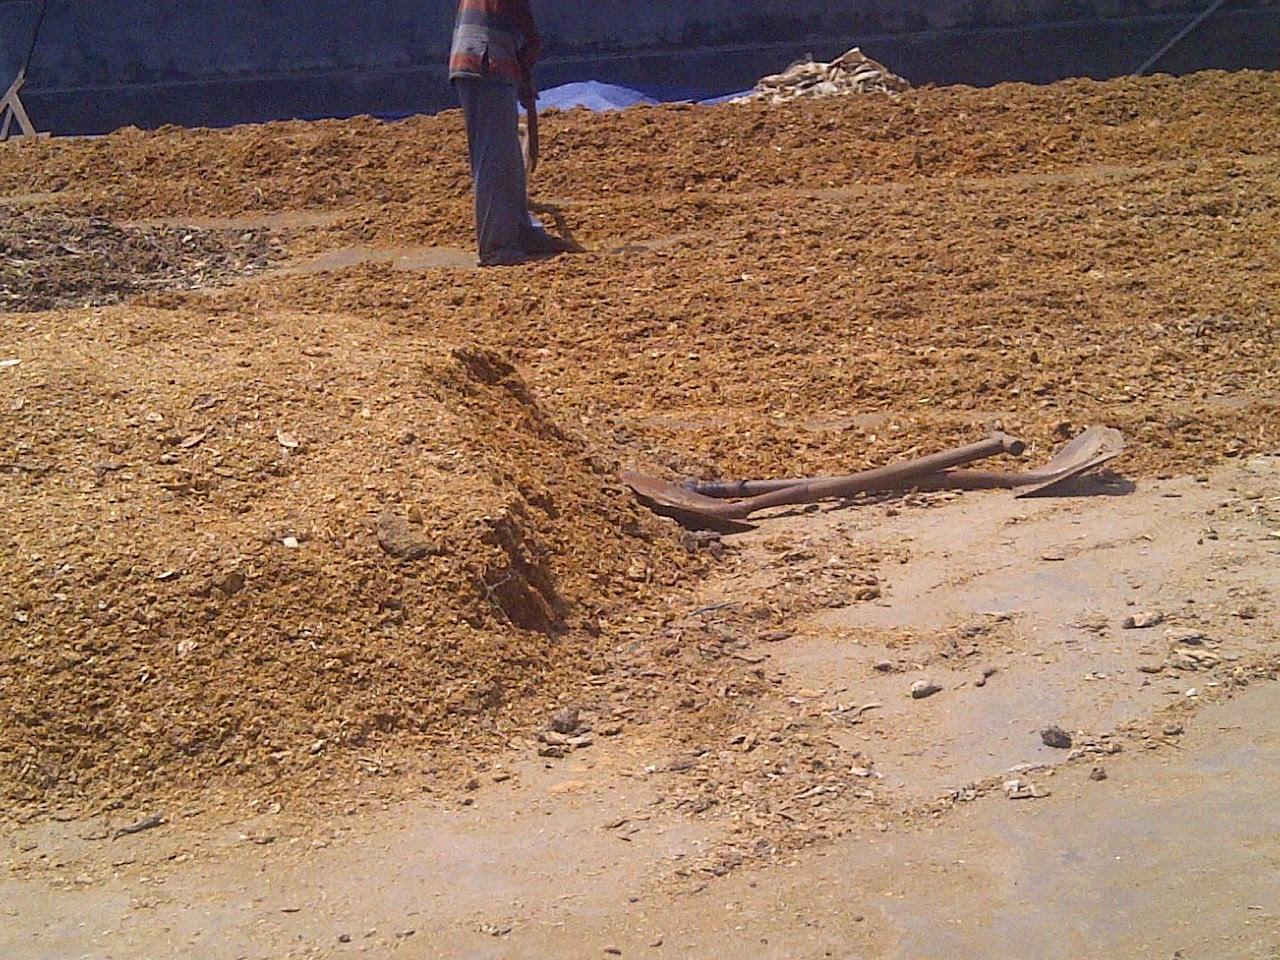 Proses Pengeringan Ikan Untuk Dijadikan Tepung